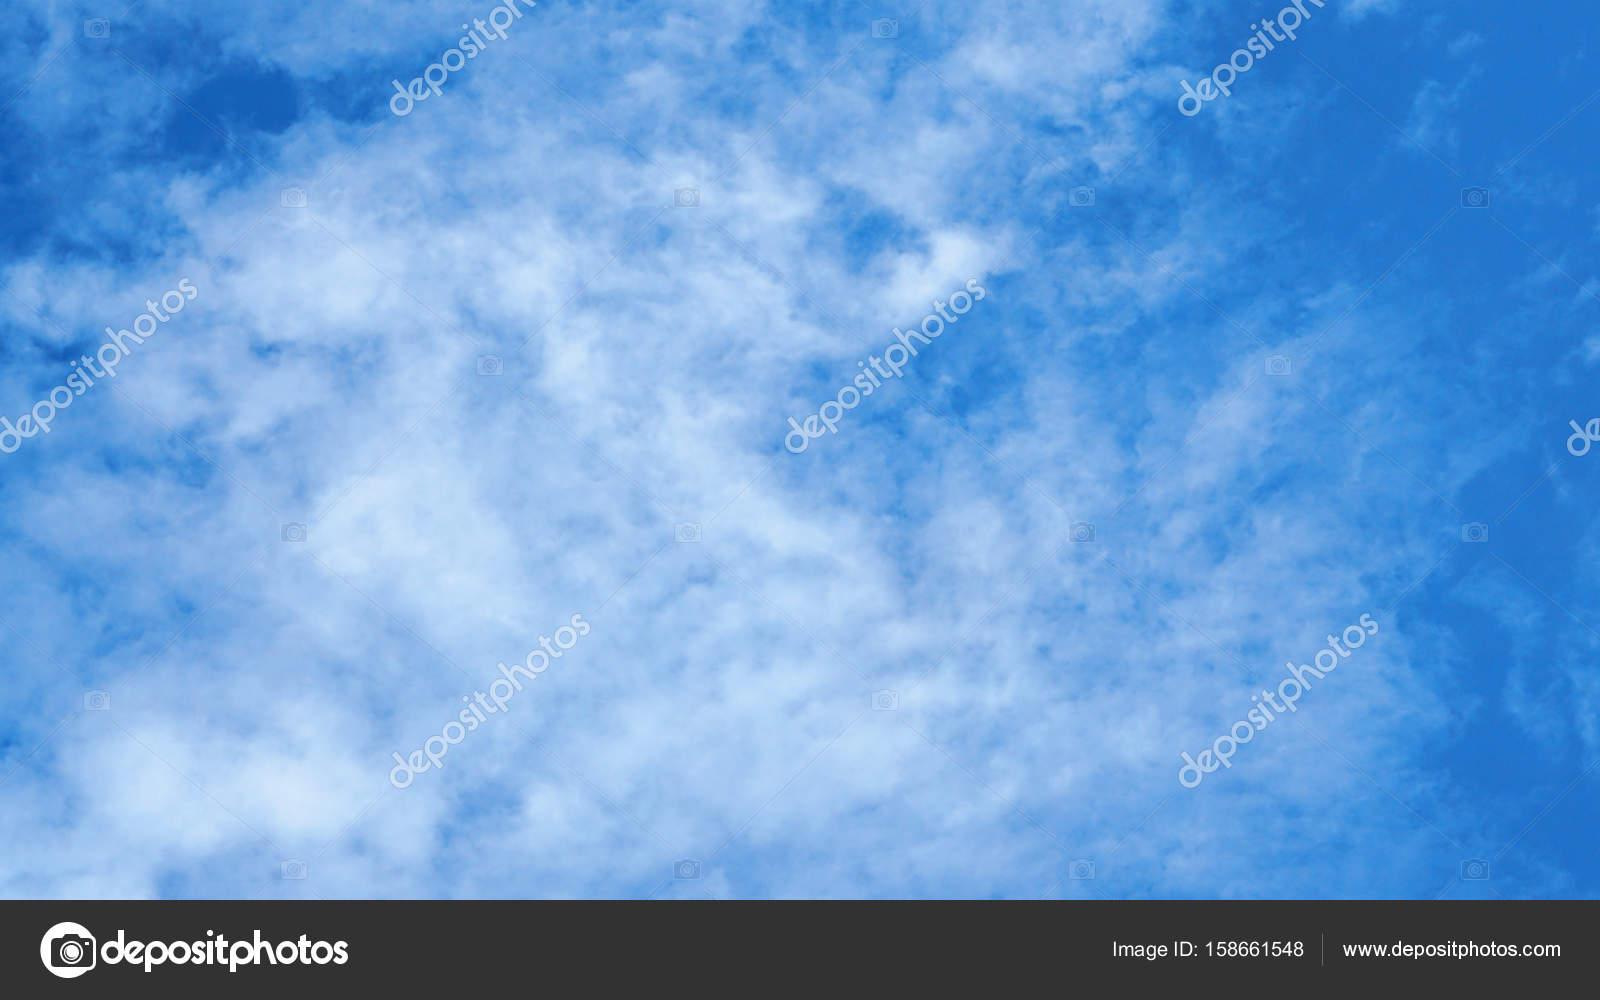 Fond Bleu Ciel Nuages Photographie Kikkalek 158661548